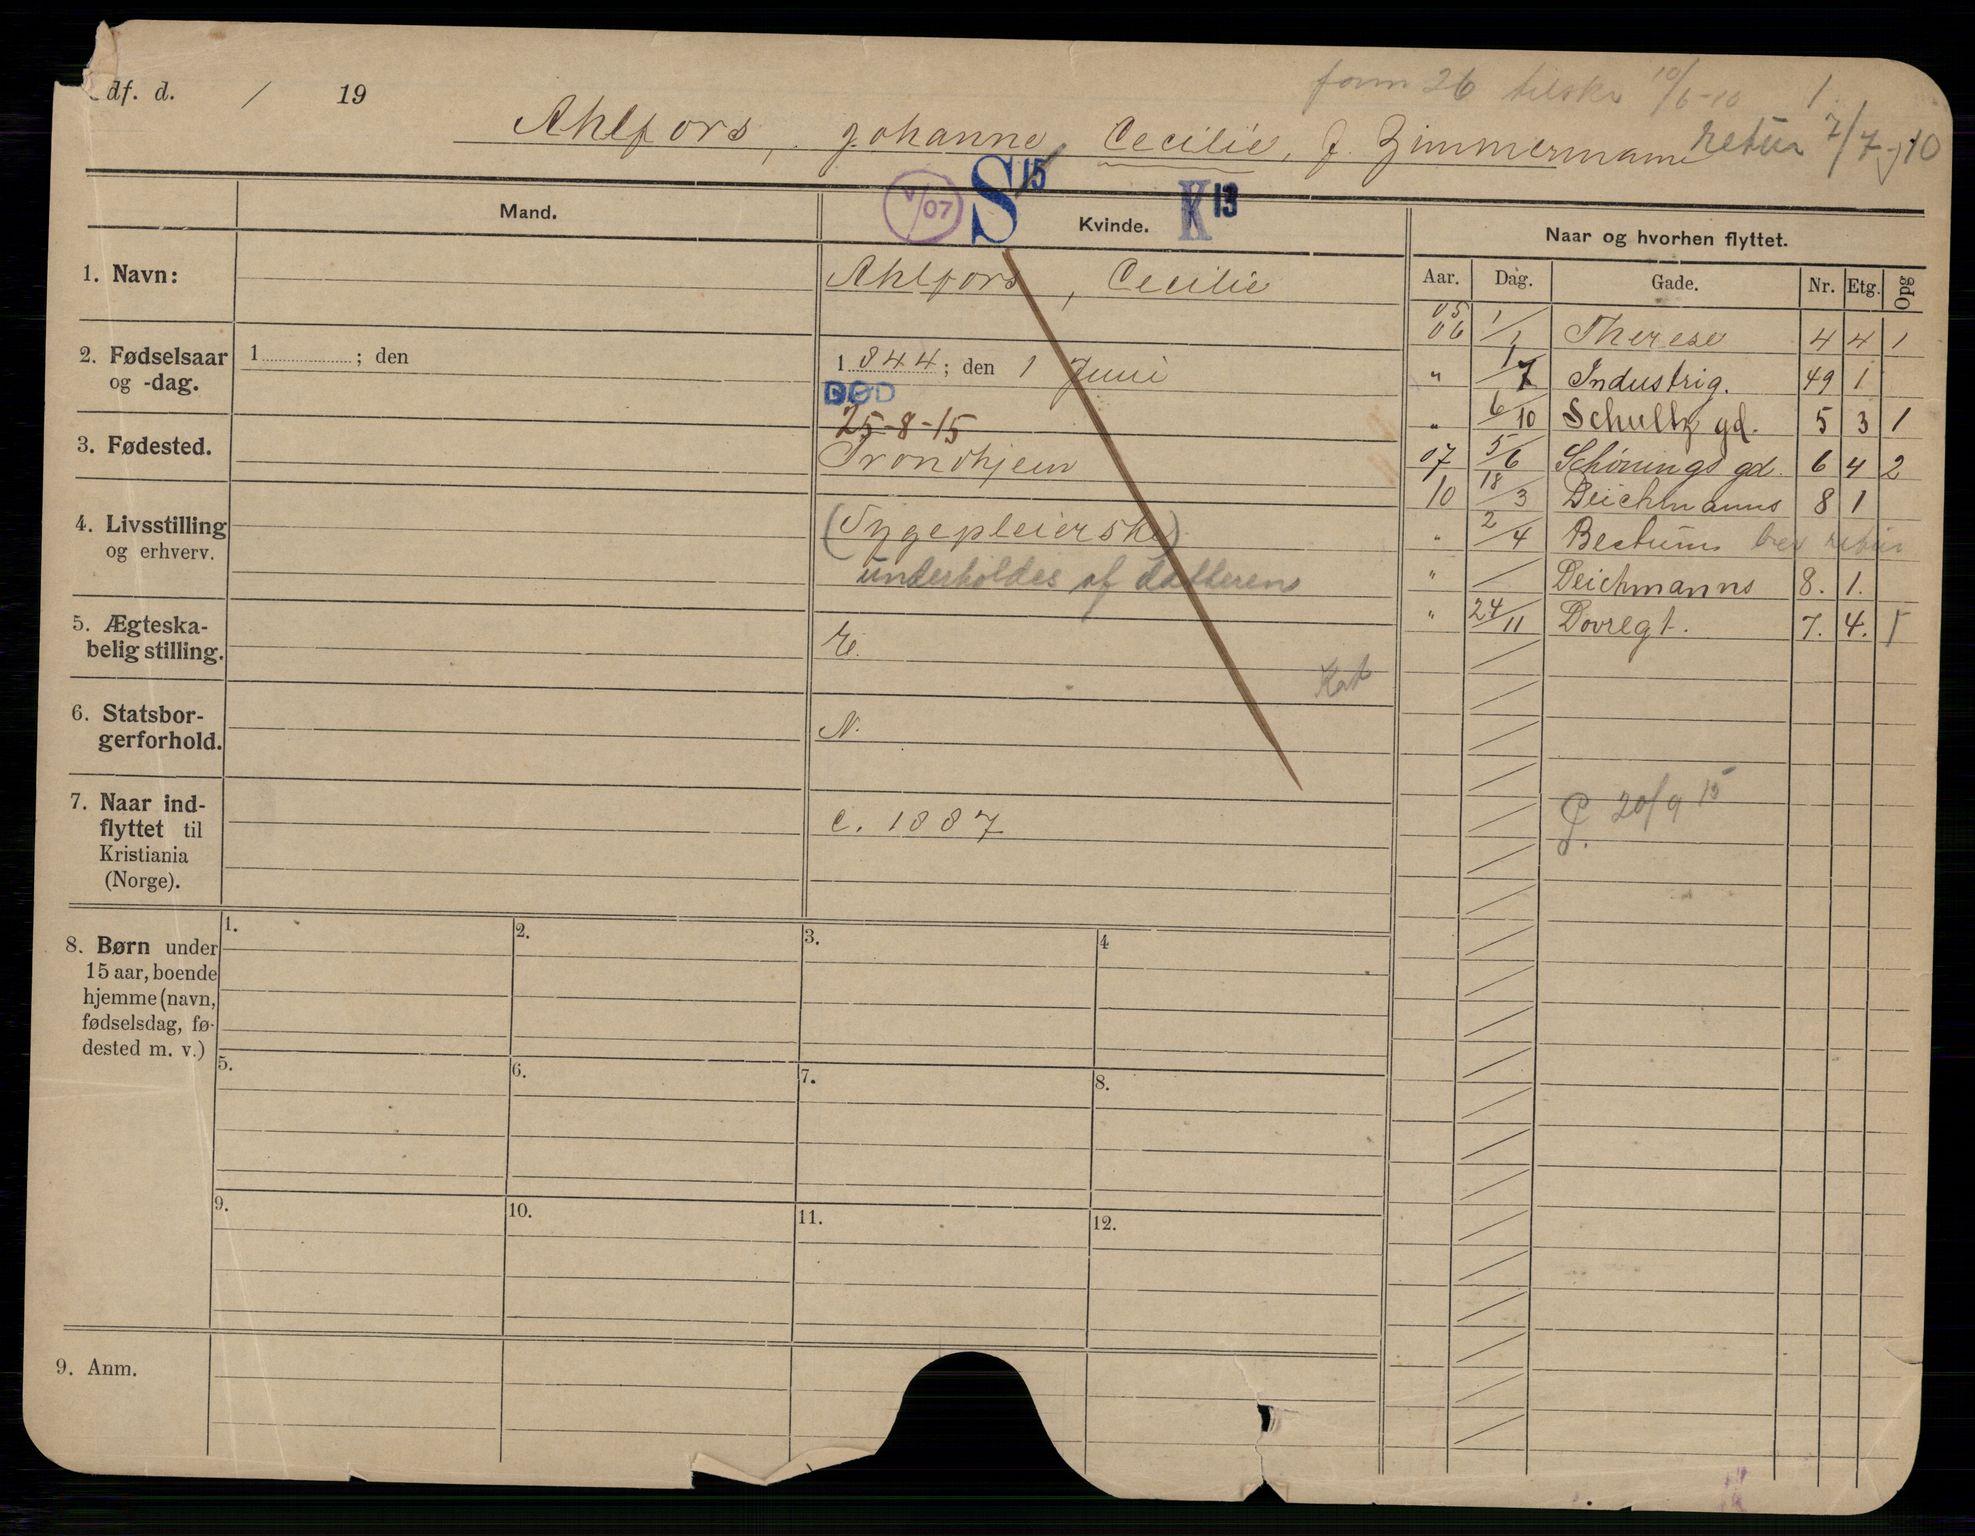 SAO, Oslo folkeregister, Registerkort, G/Gb/L0020: Kvinner, 1915